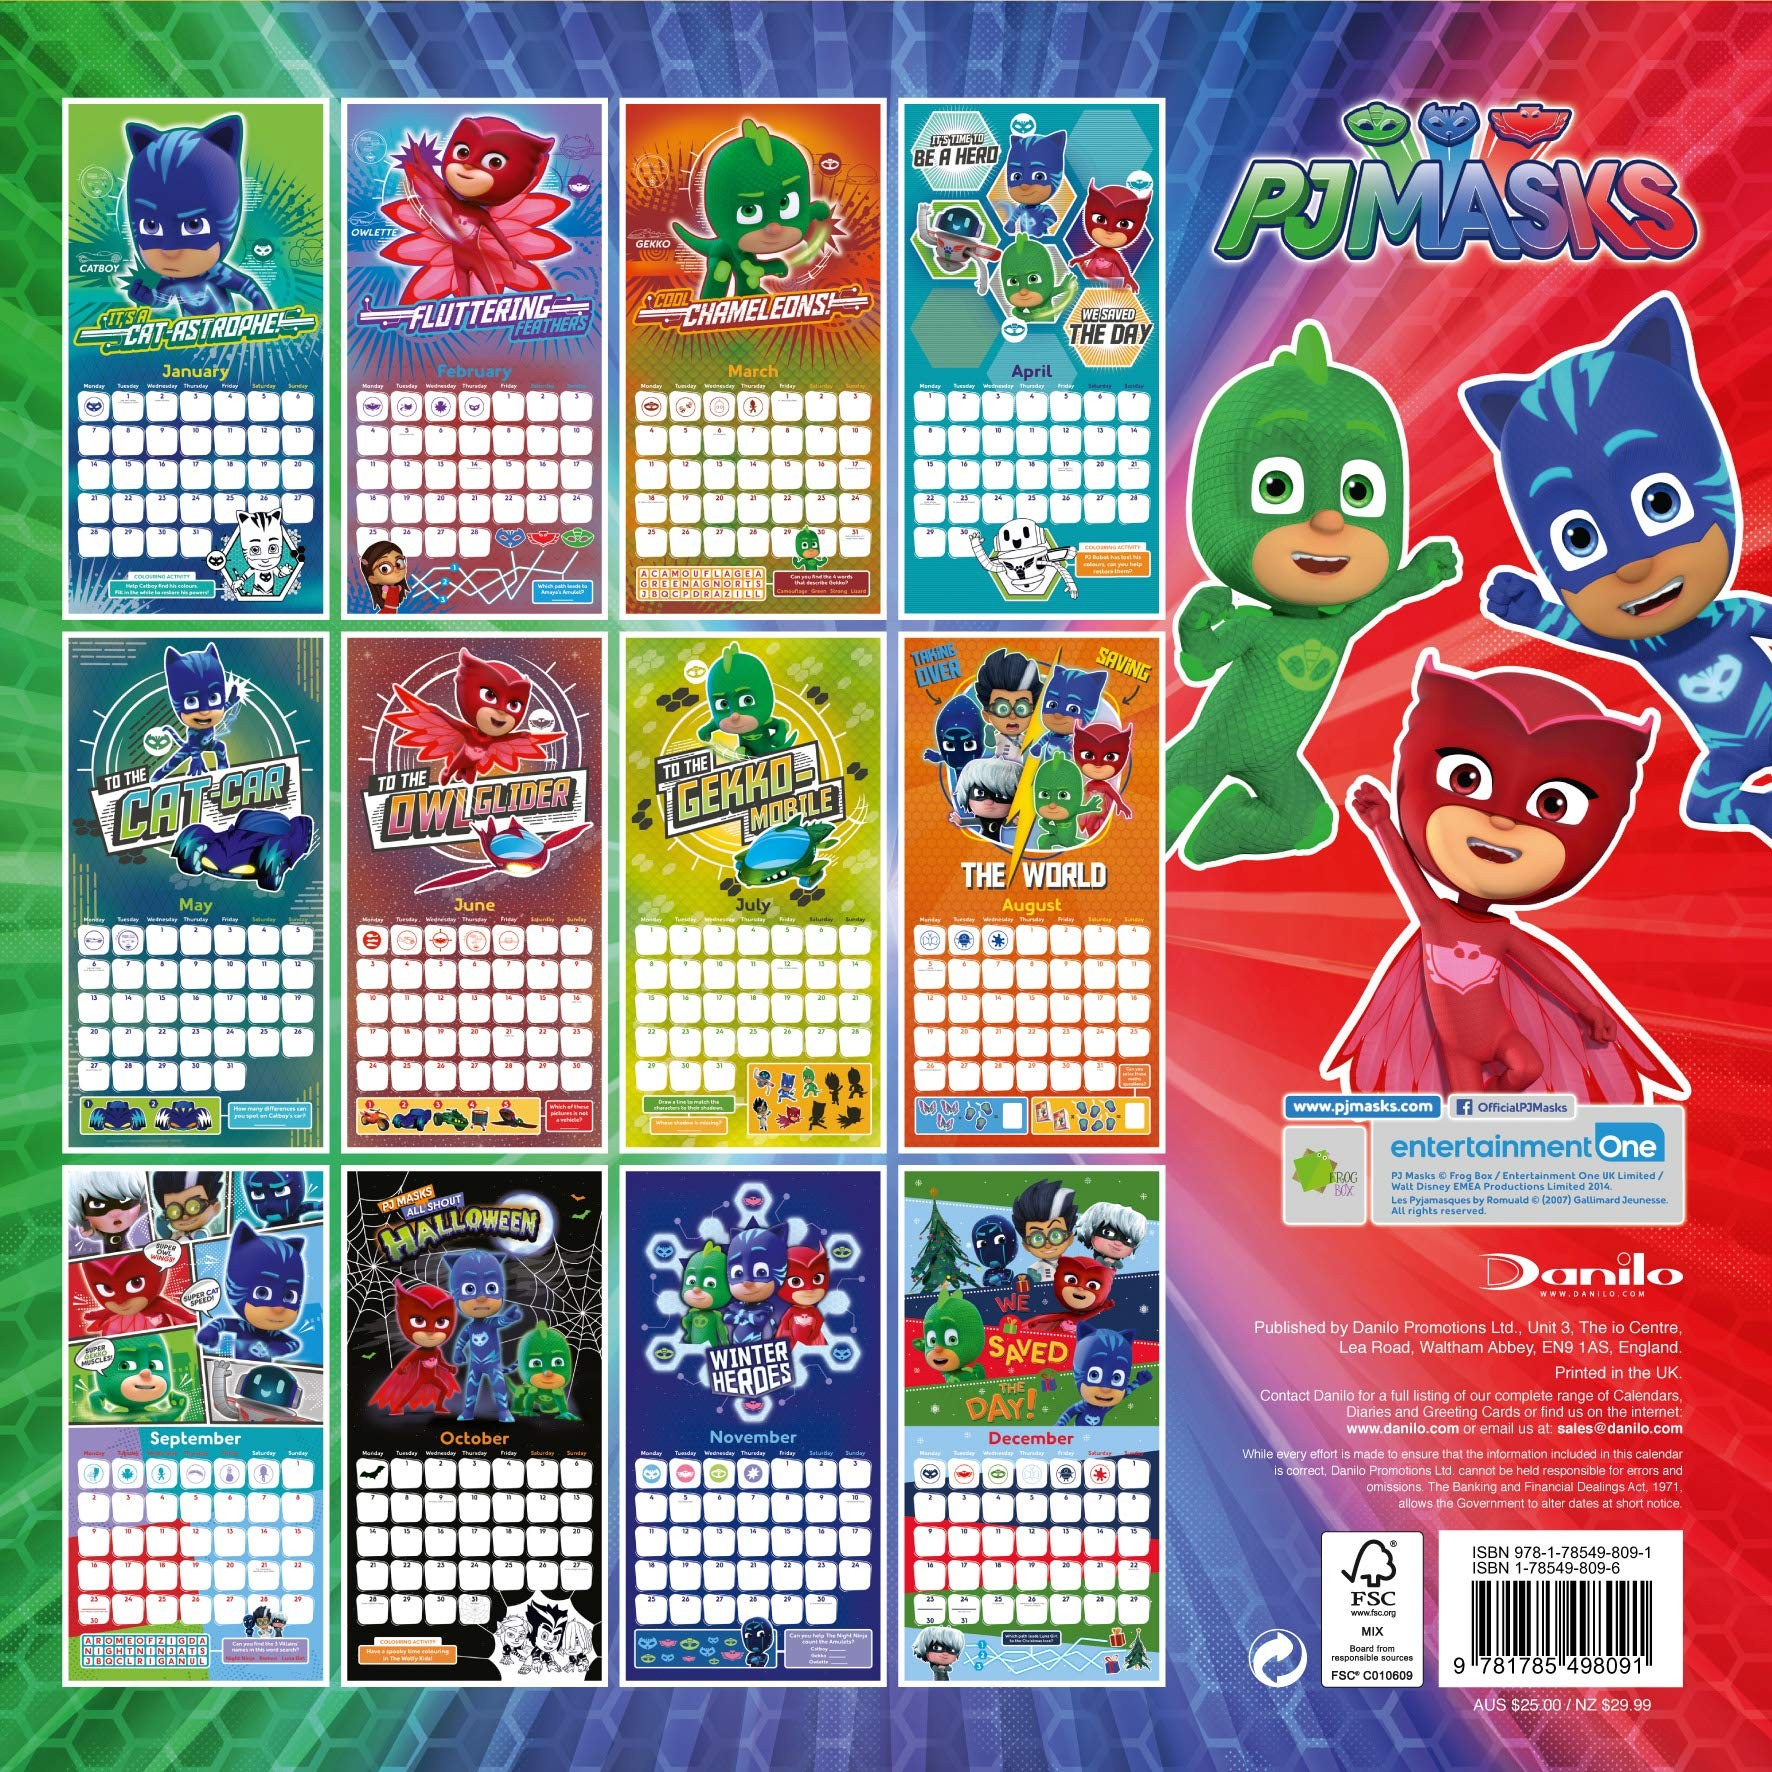 Pj Masks ficial 2019 Calendar Square Wall Calendar Format Amazon Pj Masks Books